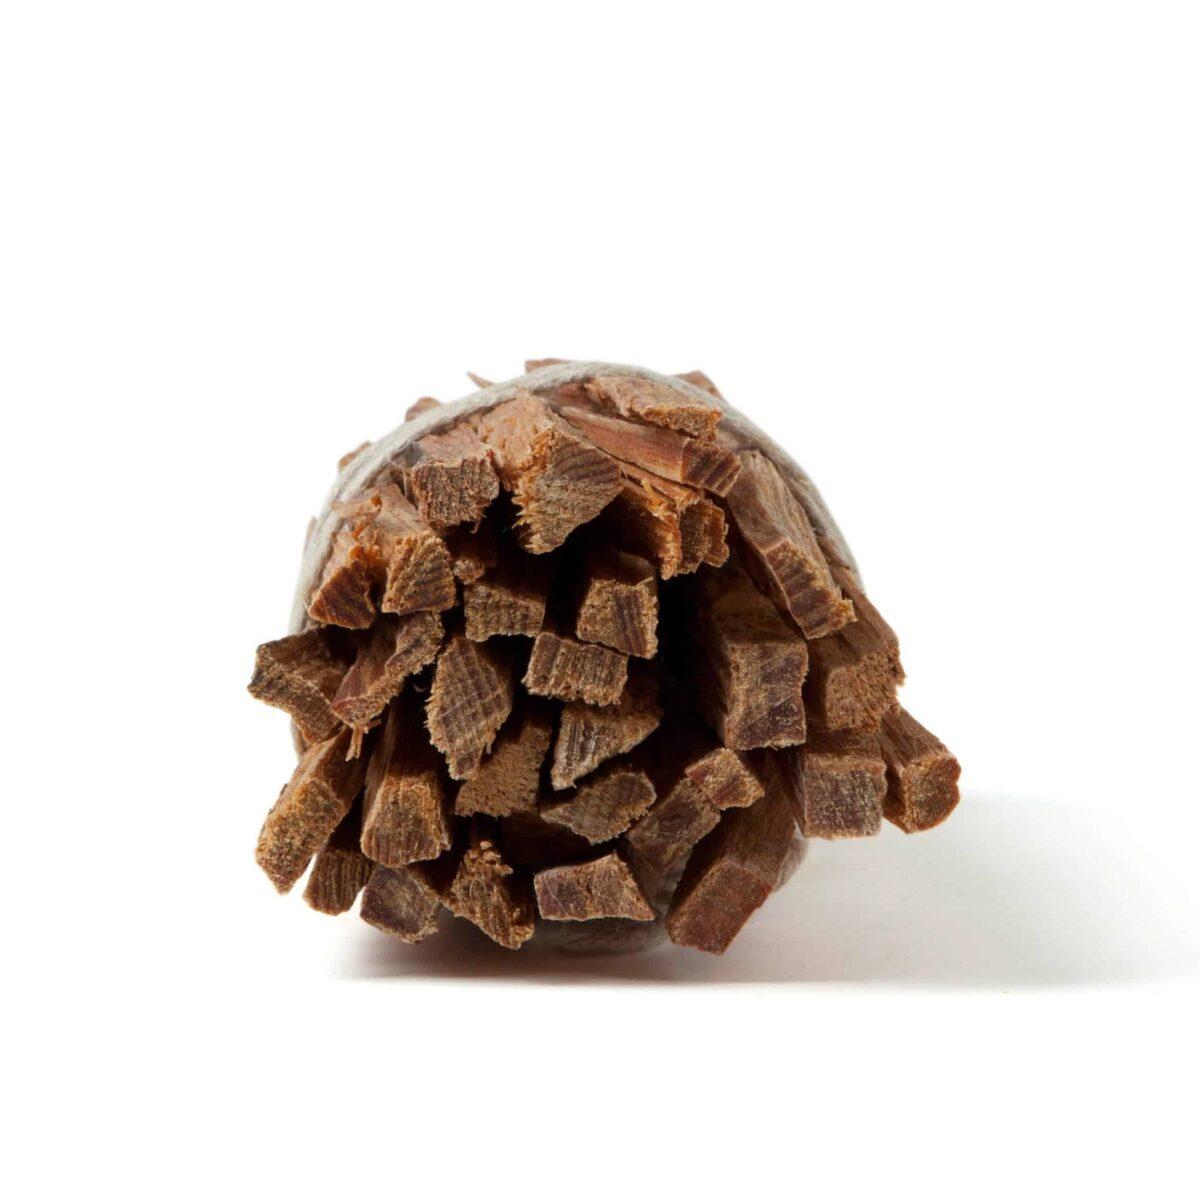 eco-products-fatwood-fire-starter-sticks-bundle-001